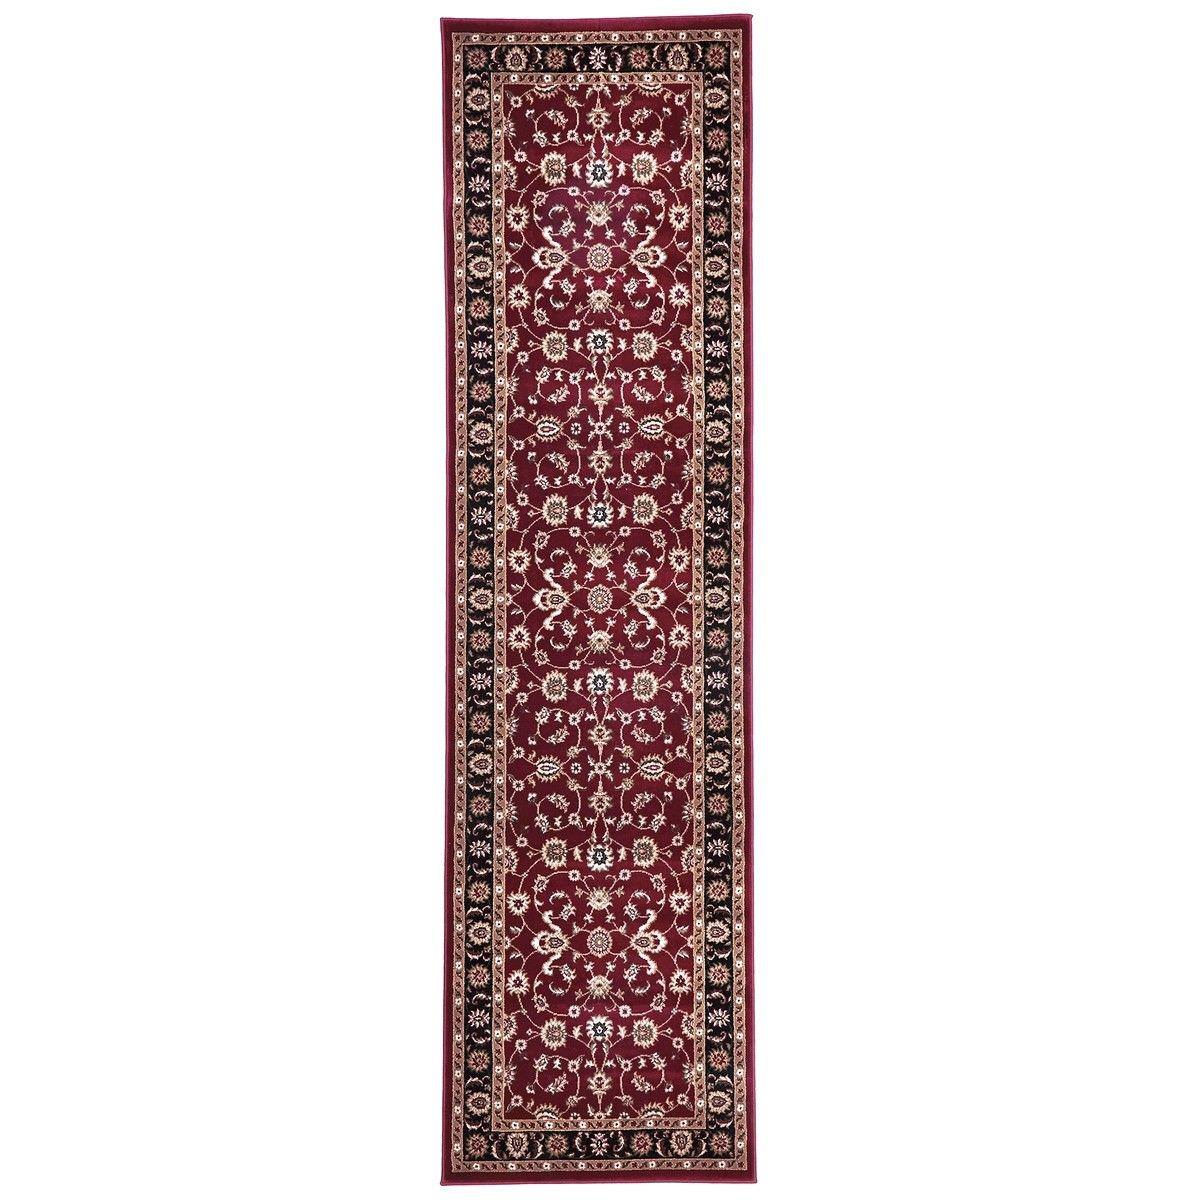 Sydney Classic Turkish Made Oriental Runner Rug, 300x80cm, Red / Black